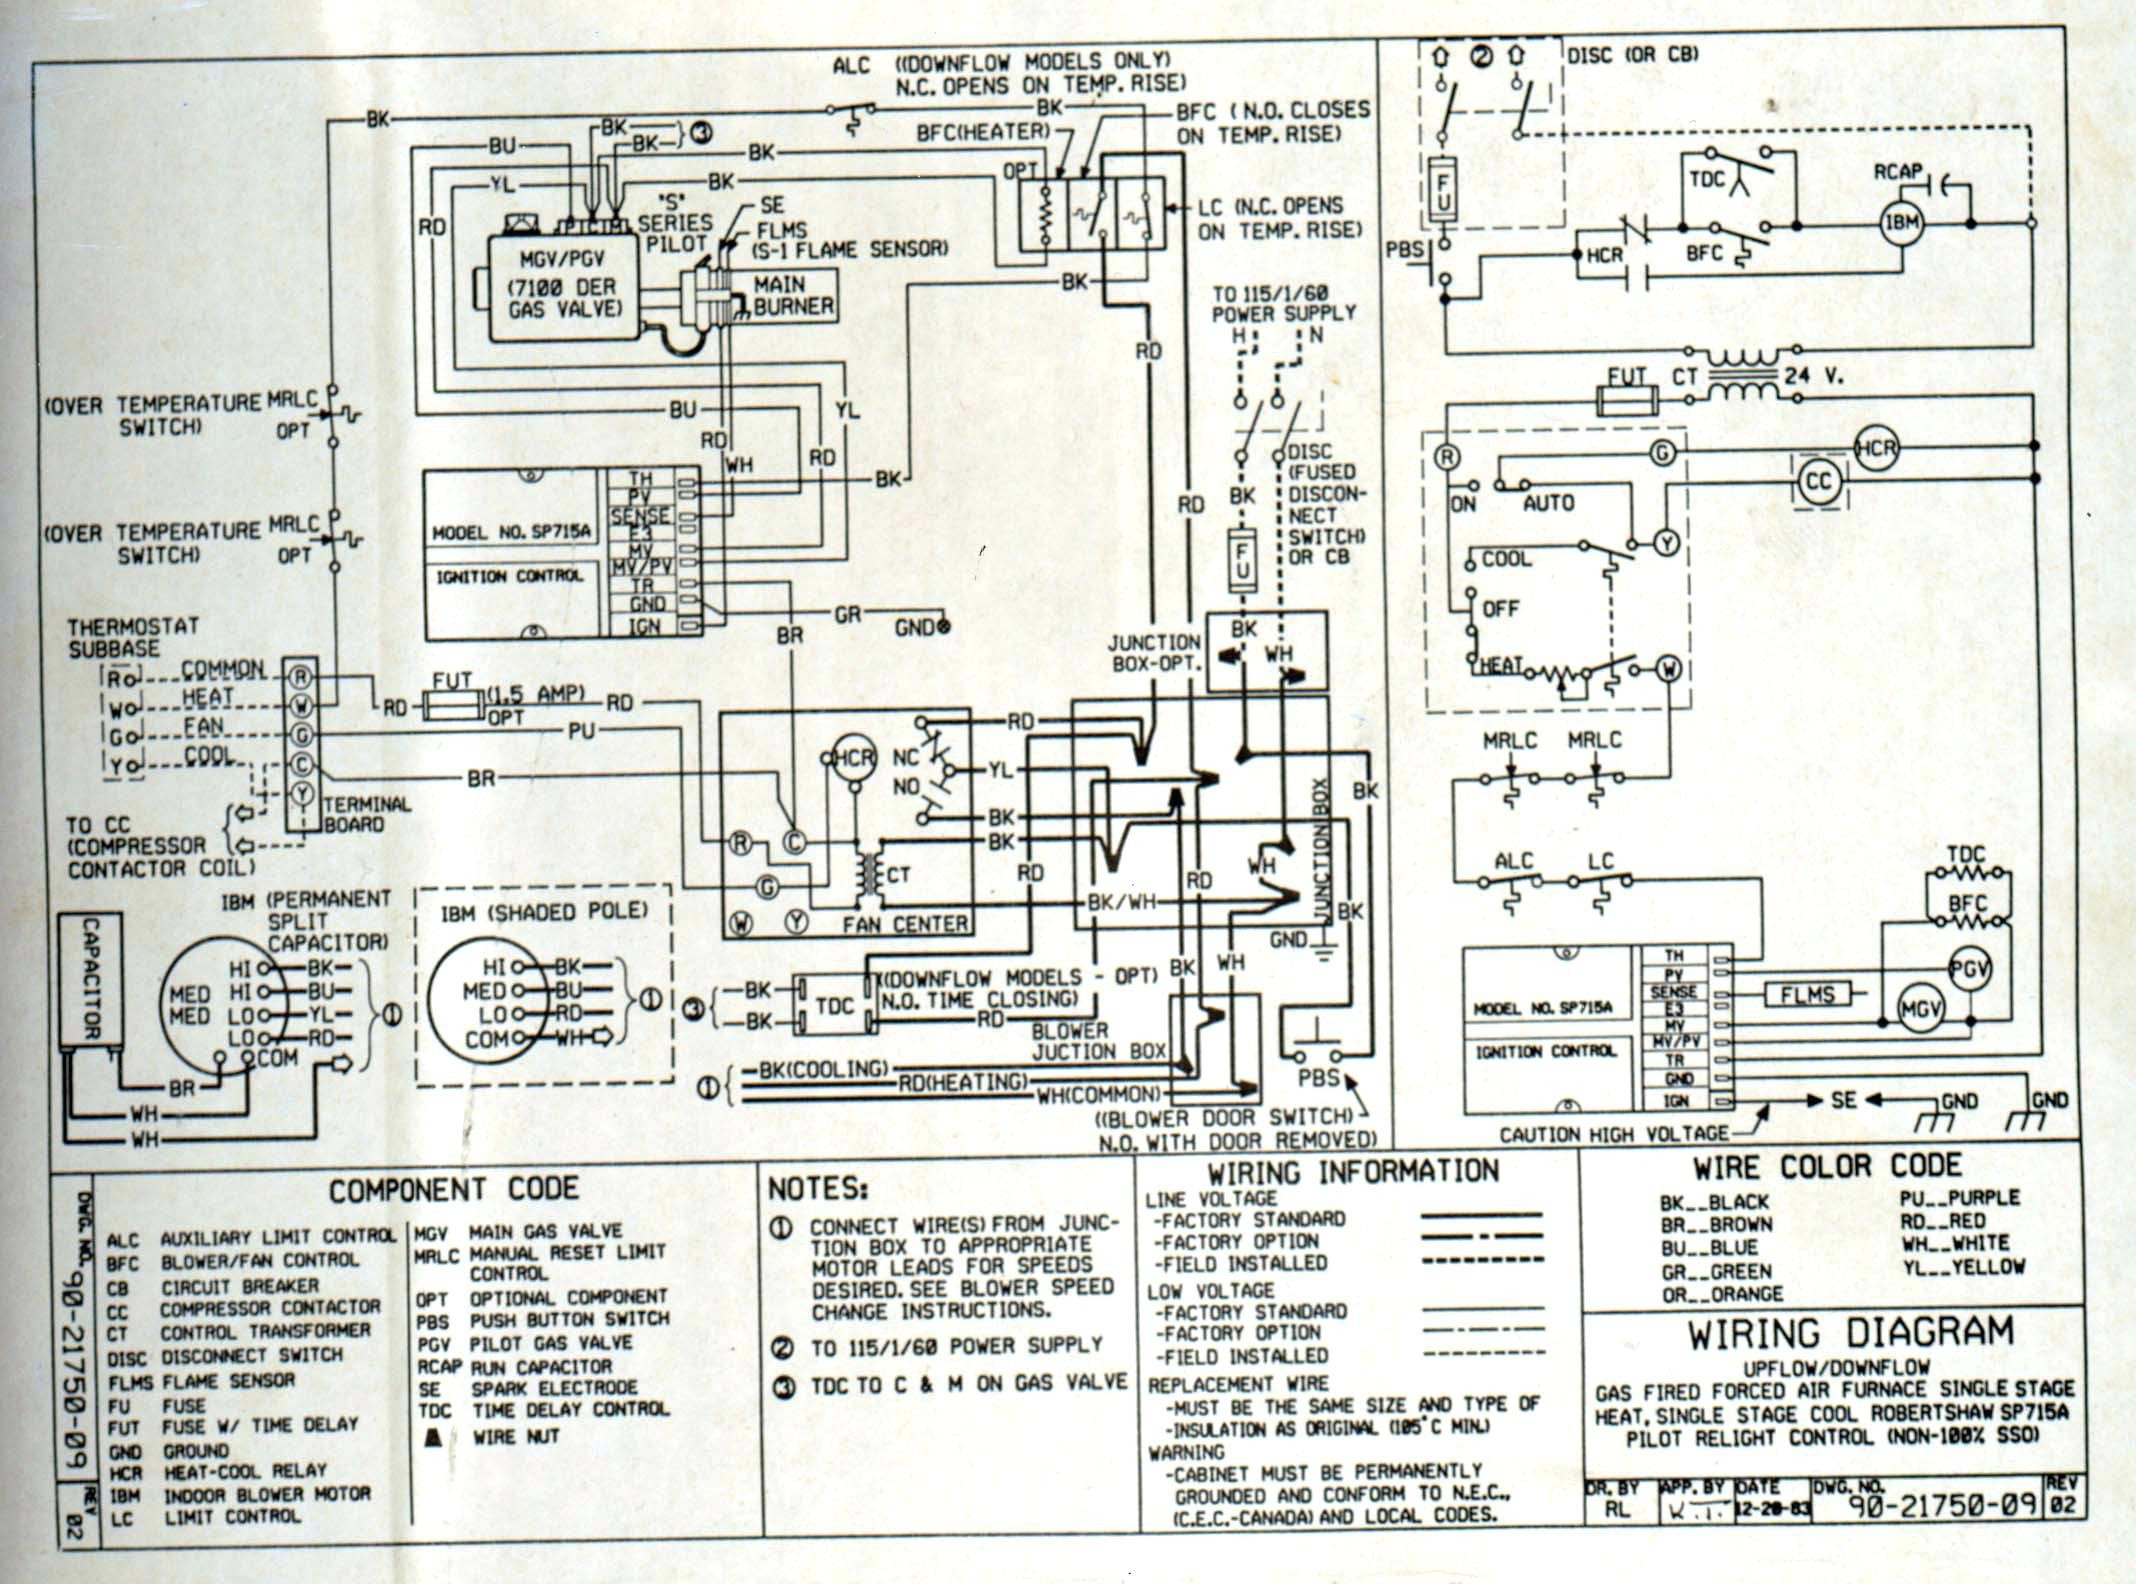 Capacitor Start Capacitor Run Motor Wiring Diagram Fresh Furnas - Capacitor Start Capacitor Run Motor Wiring Diagram